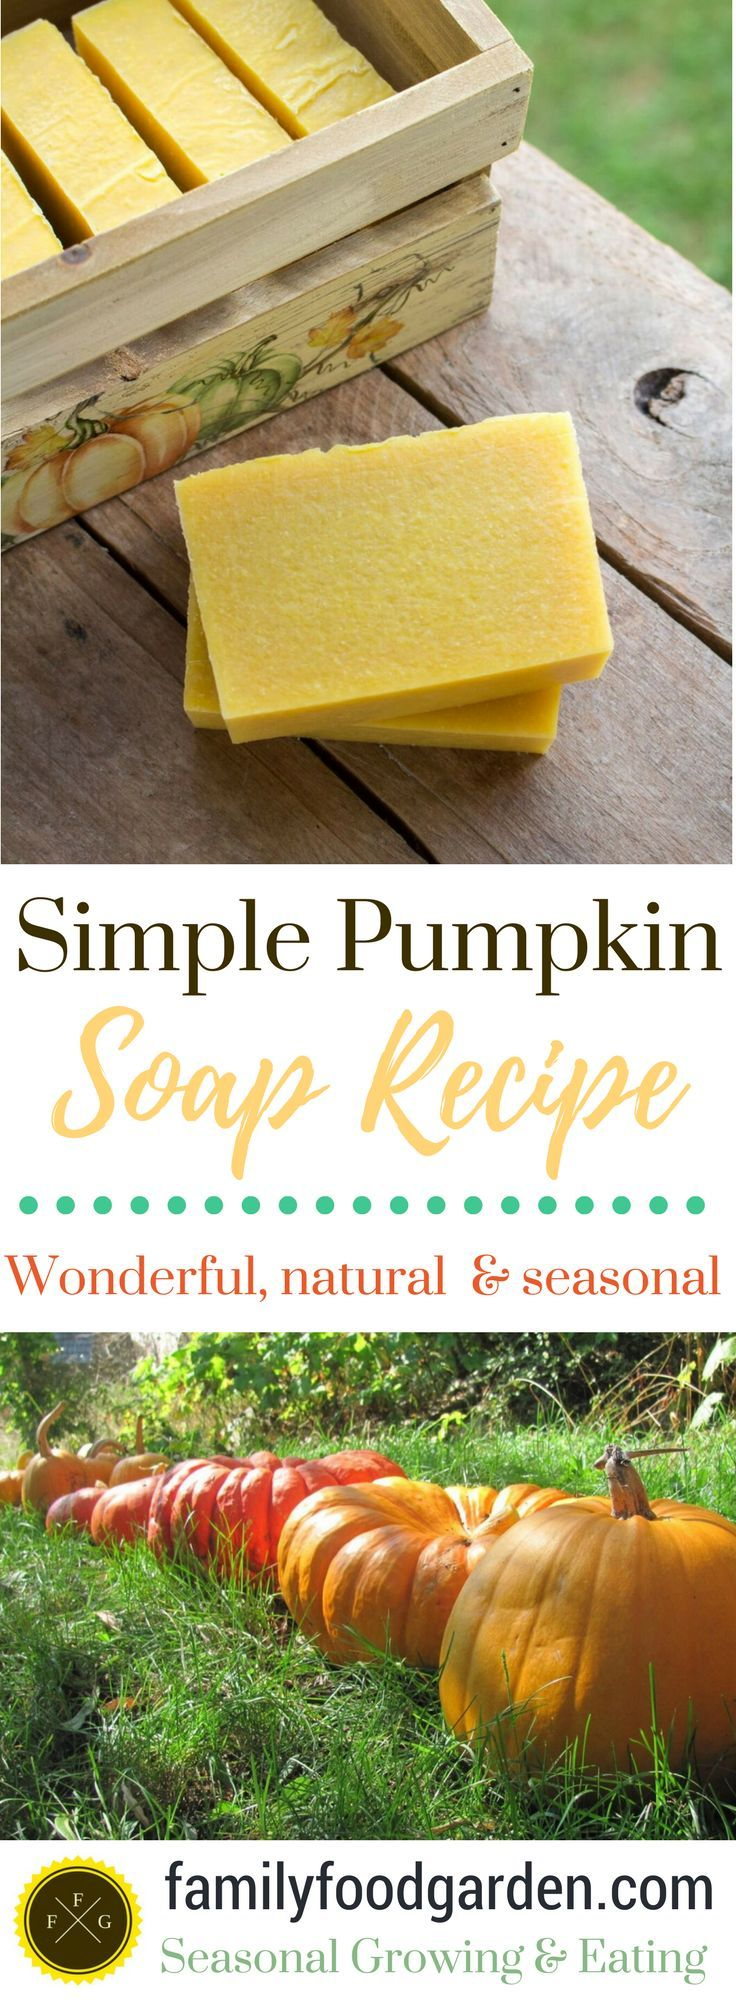 Simple and natural handmade soap recipes. Seasonal fall pumpkin soap recipe. Recipes for how to make simple handmade soaps.